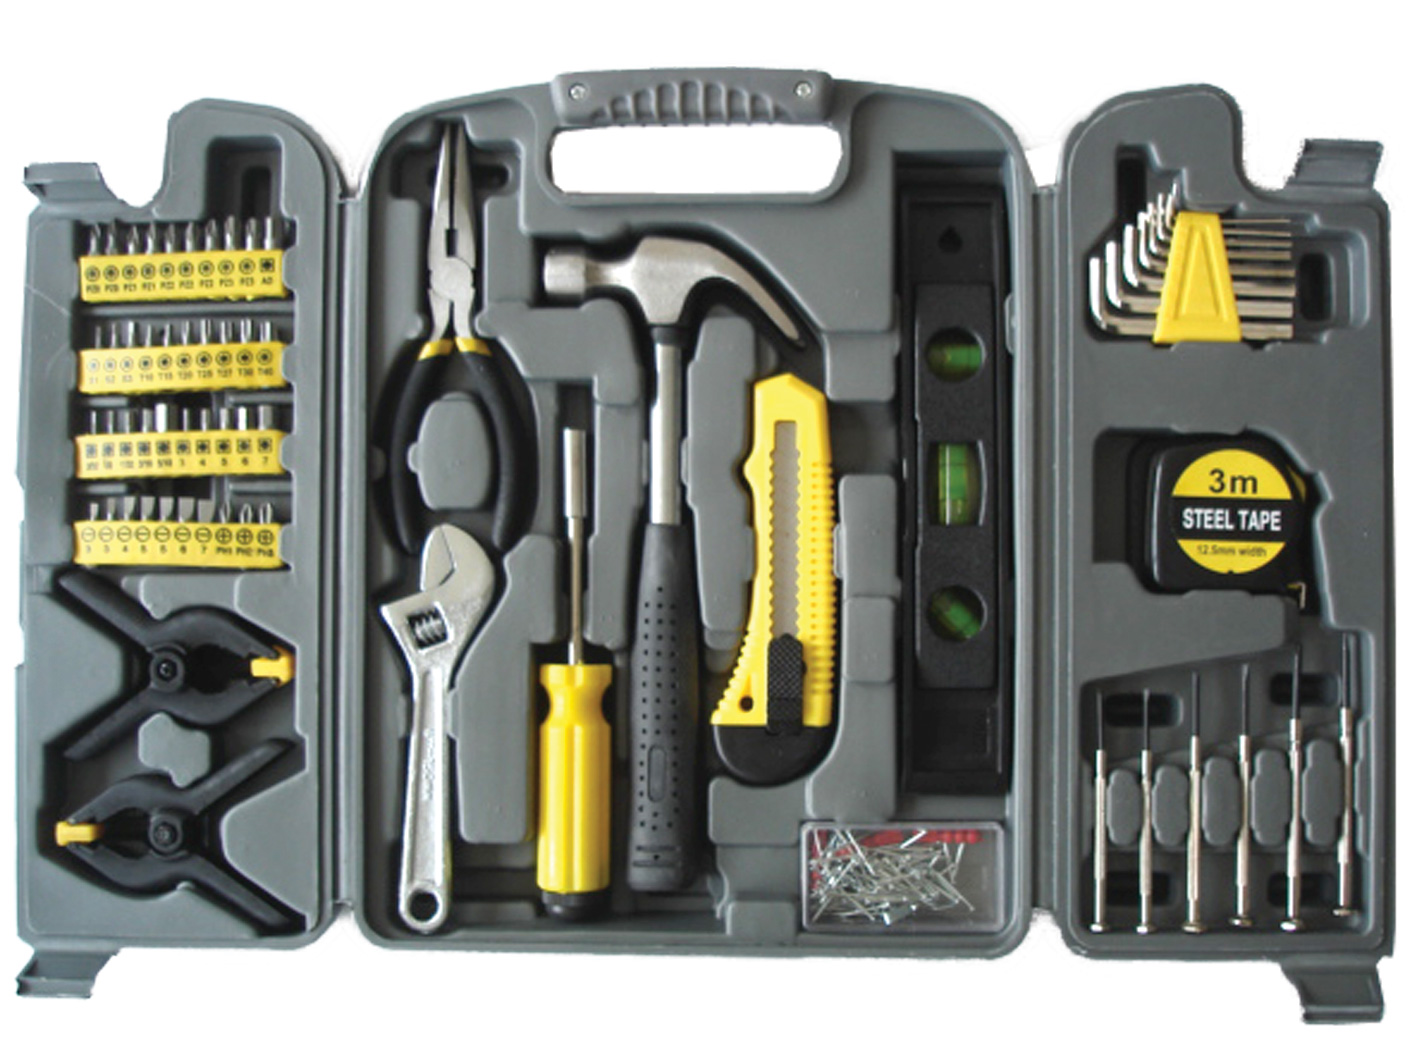 Универсальный набор инструментов Sturm! 1310-01-ts145 набор инструмента sturm 1310 01 ts145